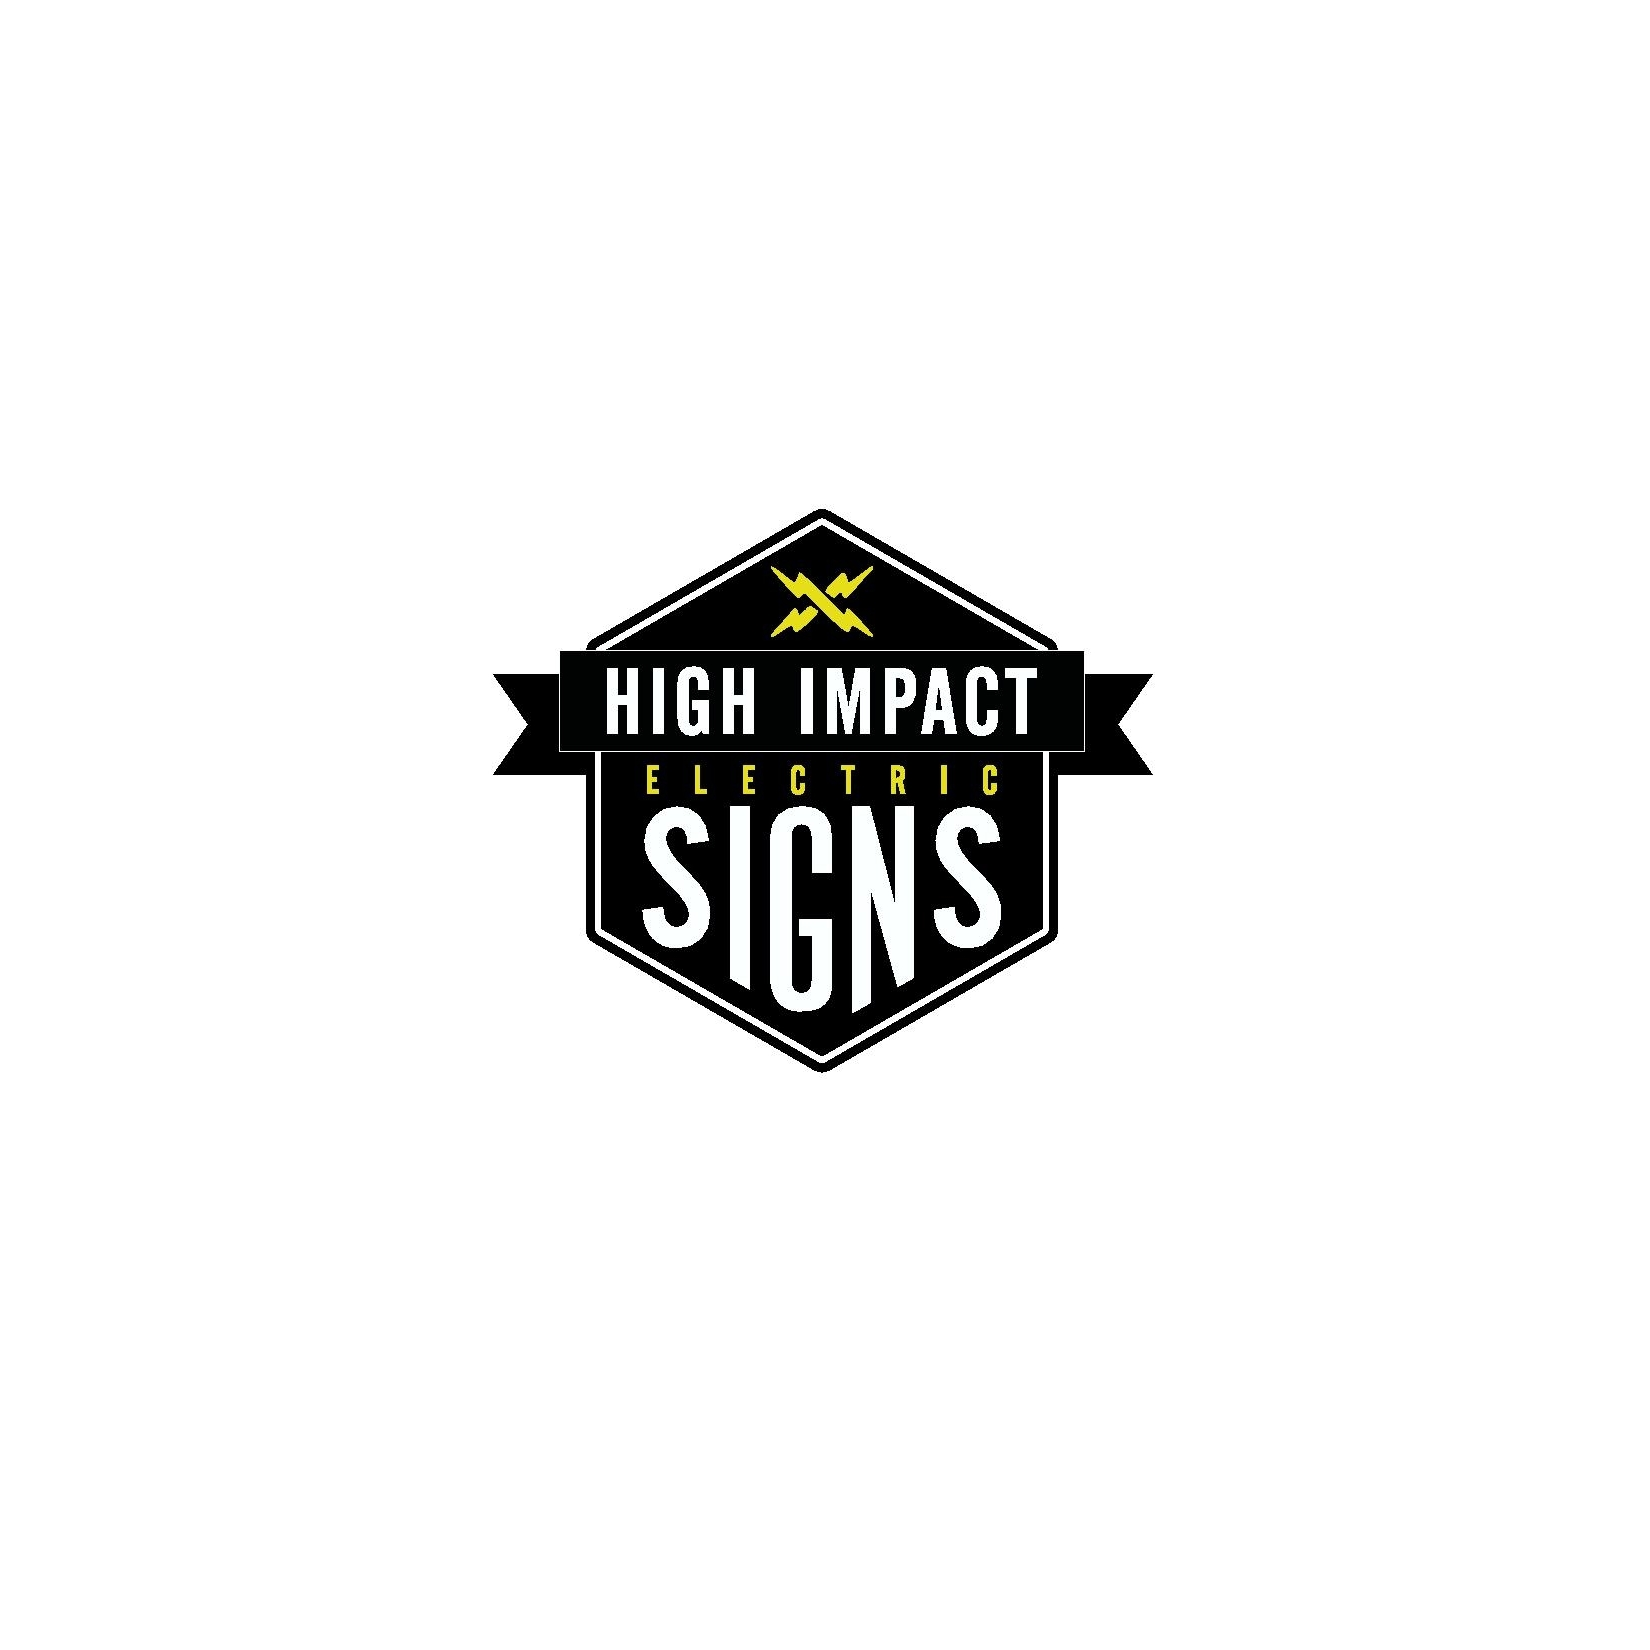 High Impact Sign & Design In Las Vegas, Nv 89118. Mens Womens Signs. Pregnancy Symptoms Signs. Simptom Signs. Difficulty Signs Of Stroke. Twd Signs Of Stroke. Legs Signs. Hole Signs. Tropical Zodiac Signs Of Stroke